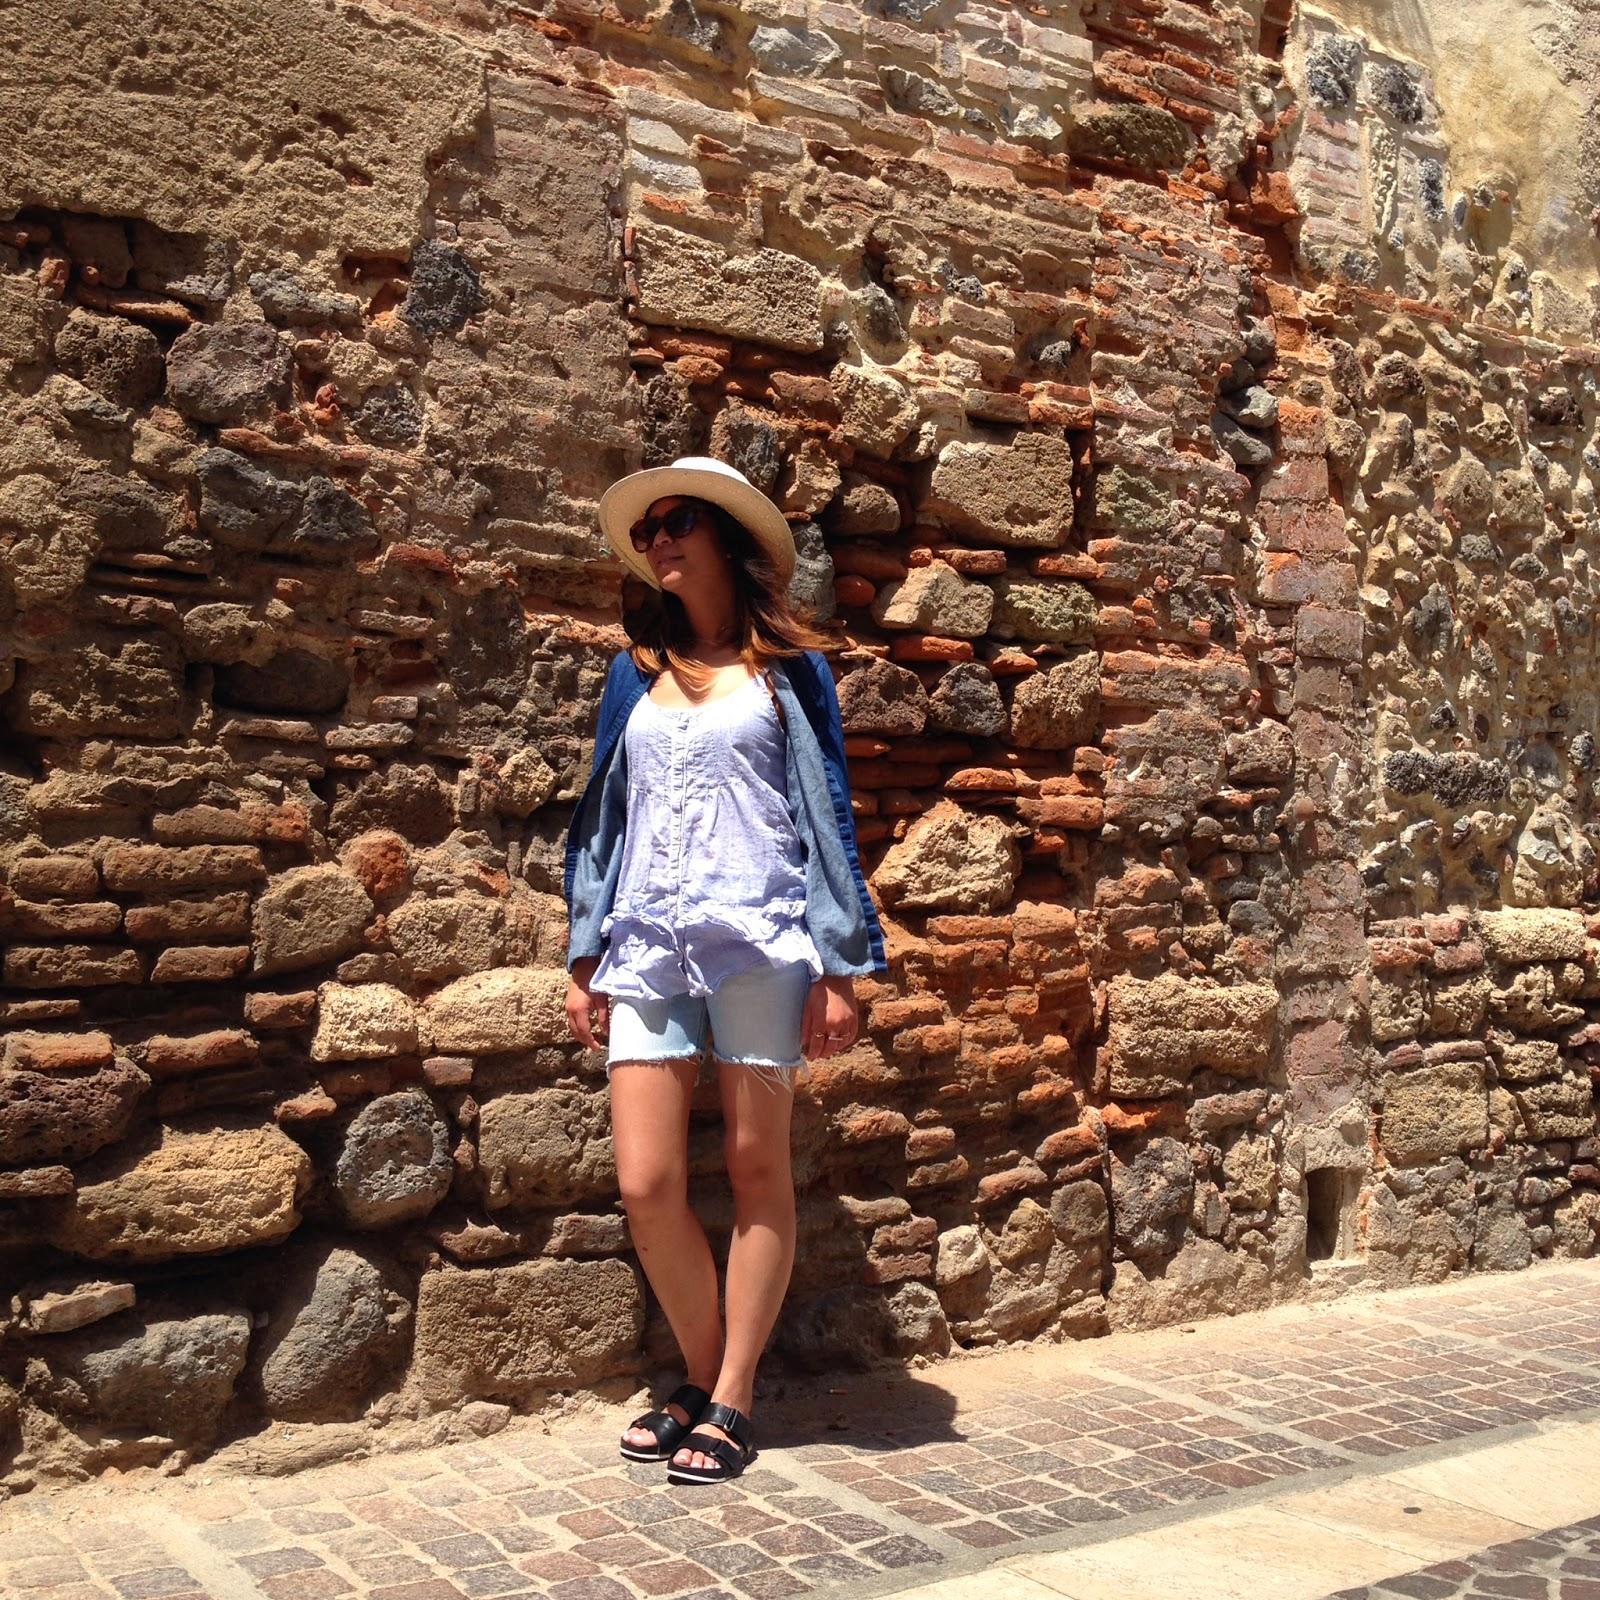 portland blogger, fashion blogger, american eagle outfitters, aldo, thrift store, uniqlo, hm, street style, italy, travel, sardinia, fashion blogger